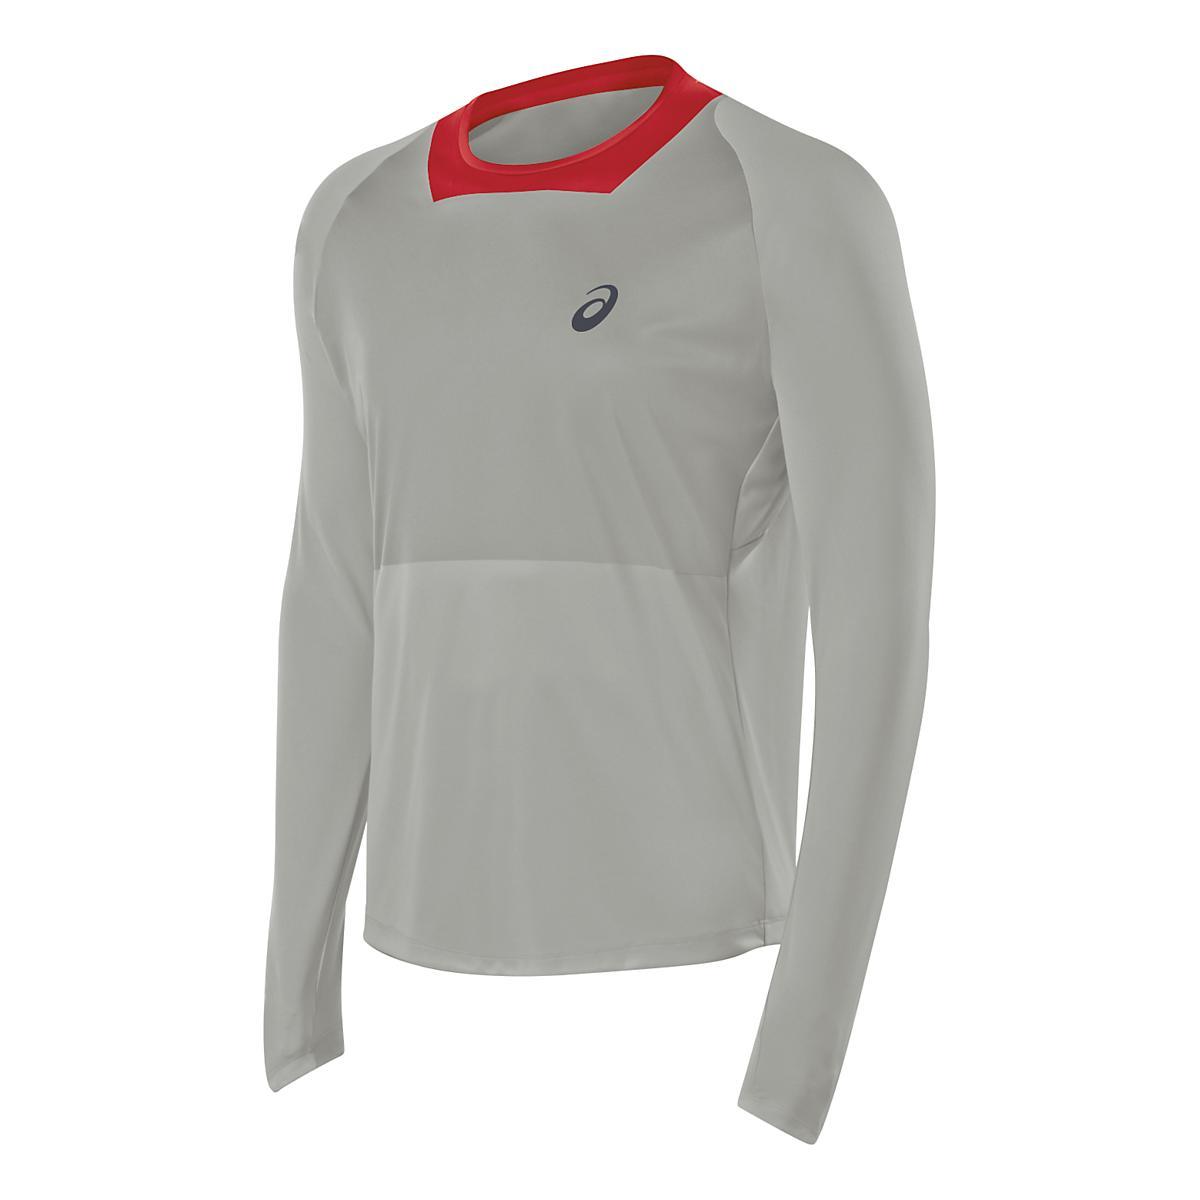 Men's ASICS�Athlete Long Sleeve Top